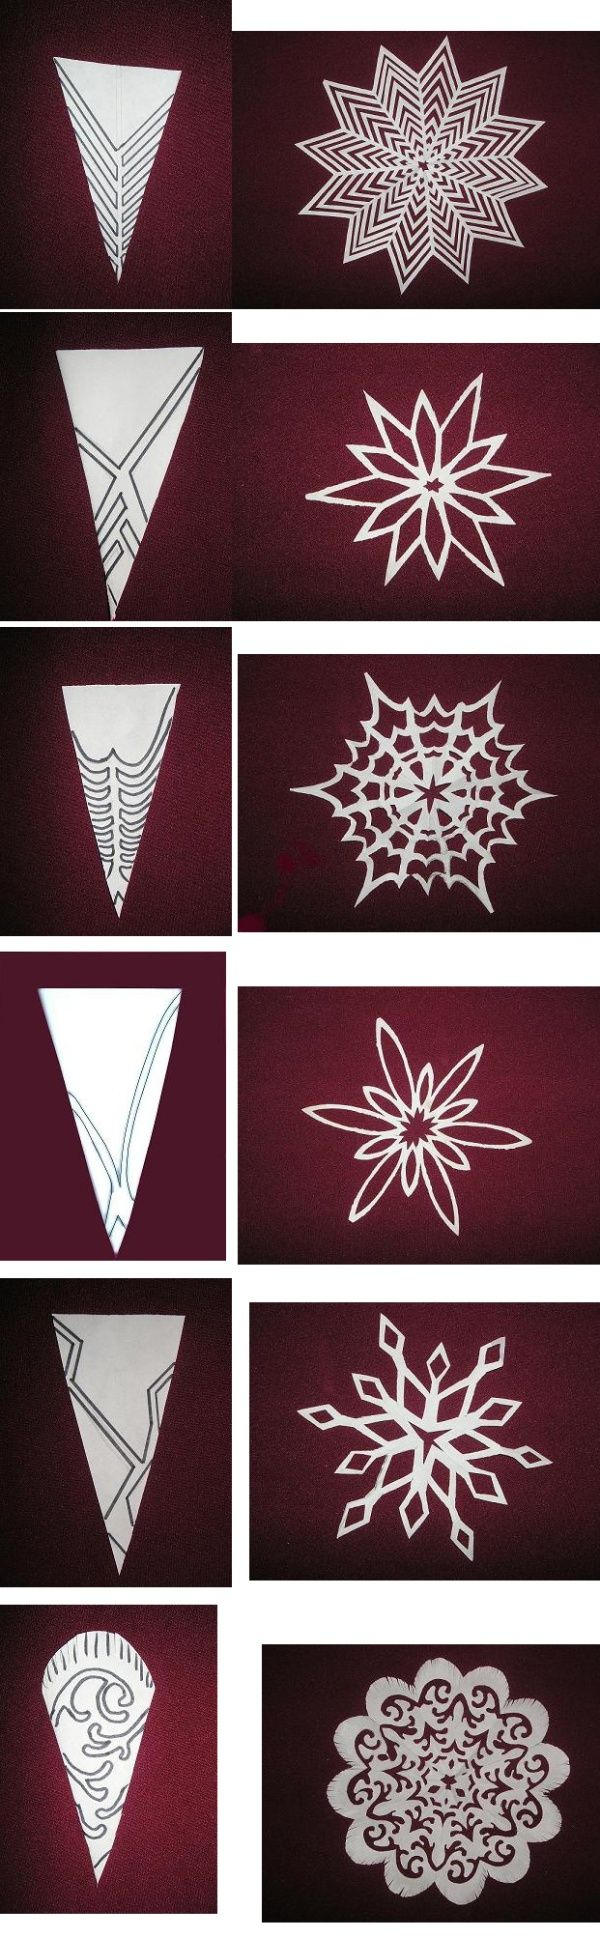 54e9997c91a6a56c9835109abd10ae55--paper-snowflake-designs-snowflake-template